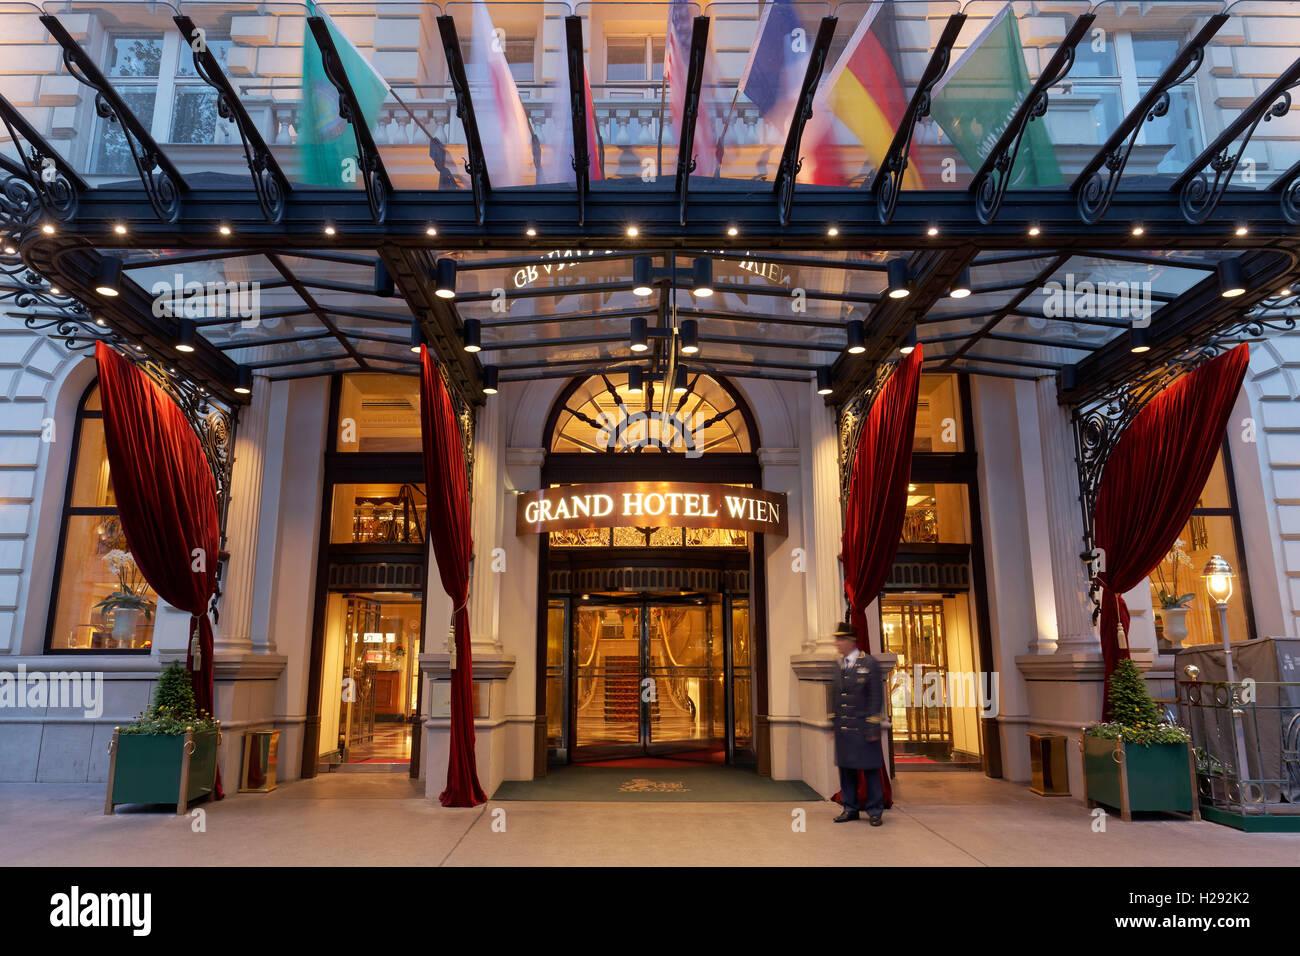 Grand Hotel Wien 5 Star Luxury Hotel Ringstrasse 1st District